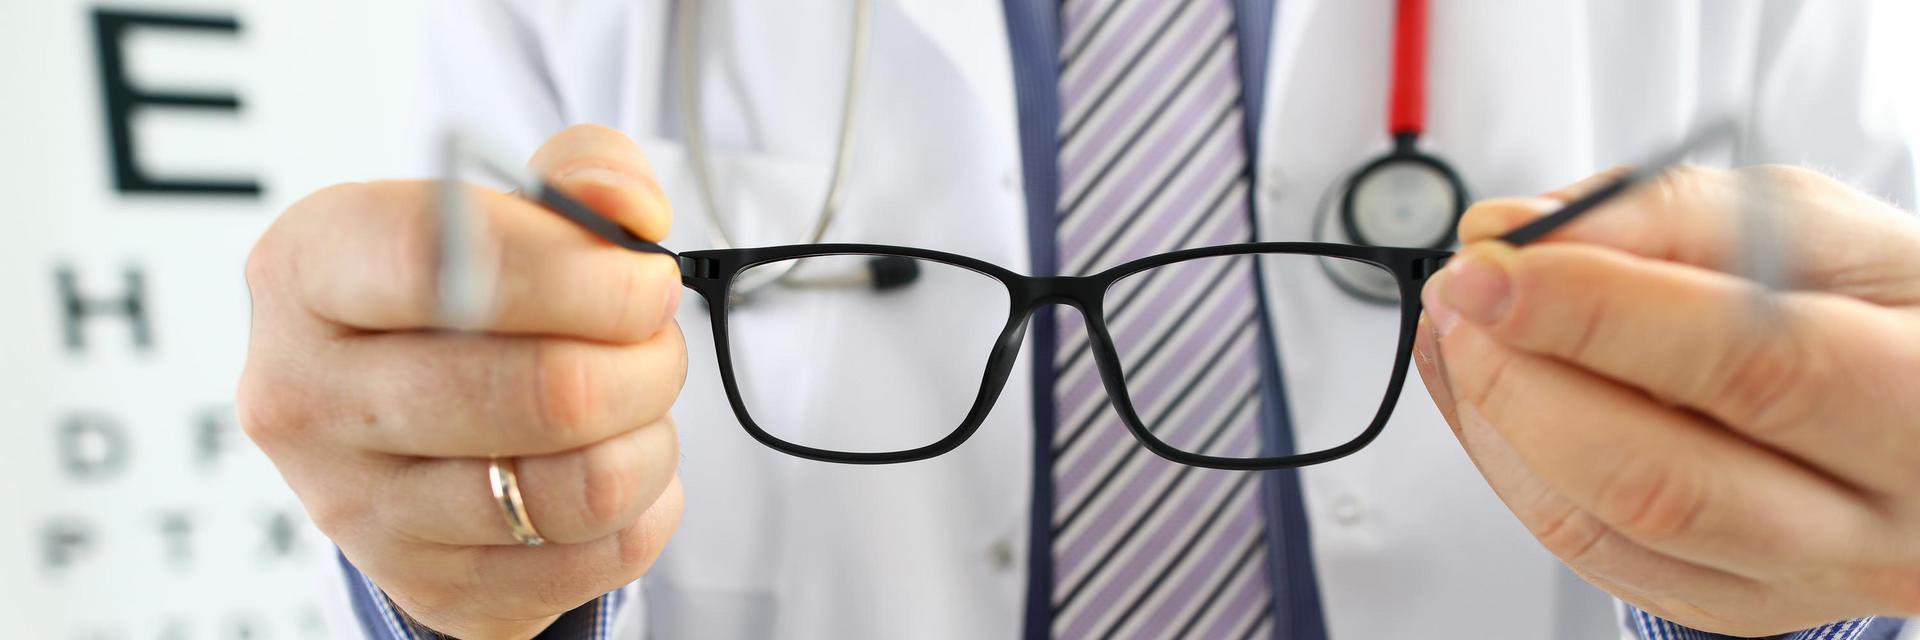 Vision and Hearing Exams - info-hero